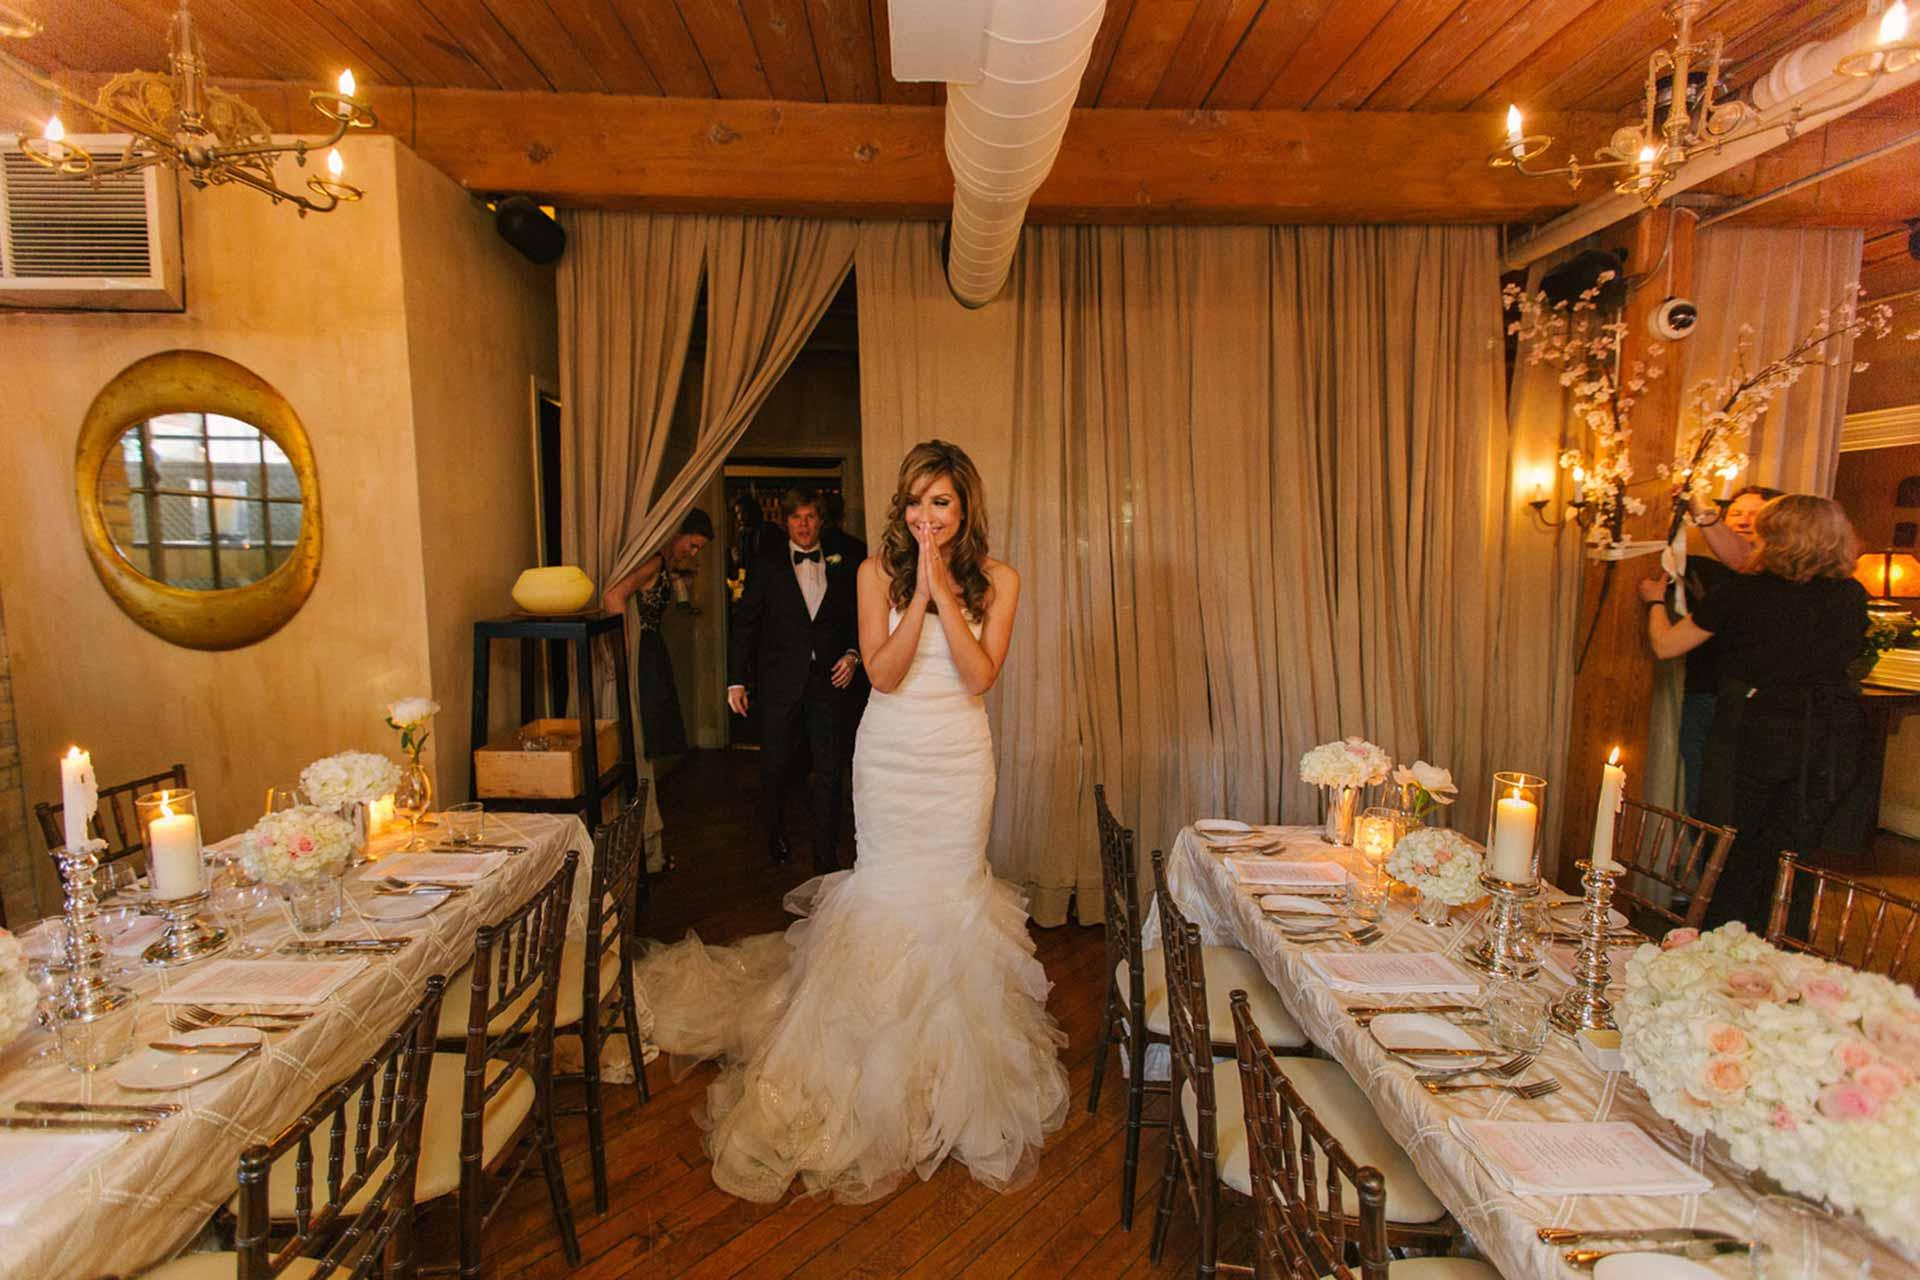 Elegant Toronto Wedding Venue - Restaurant Reception Tablescape